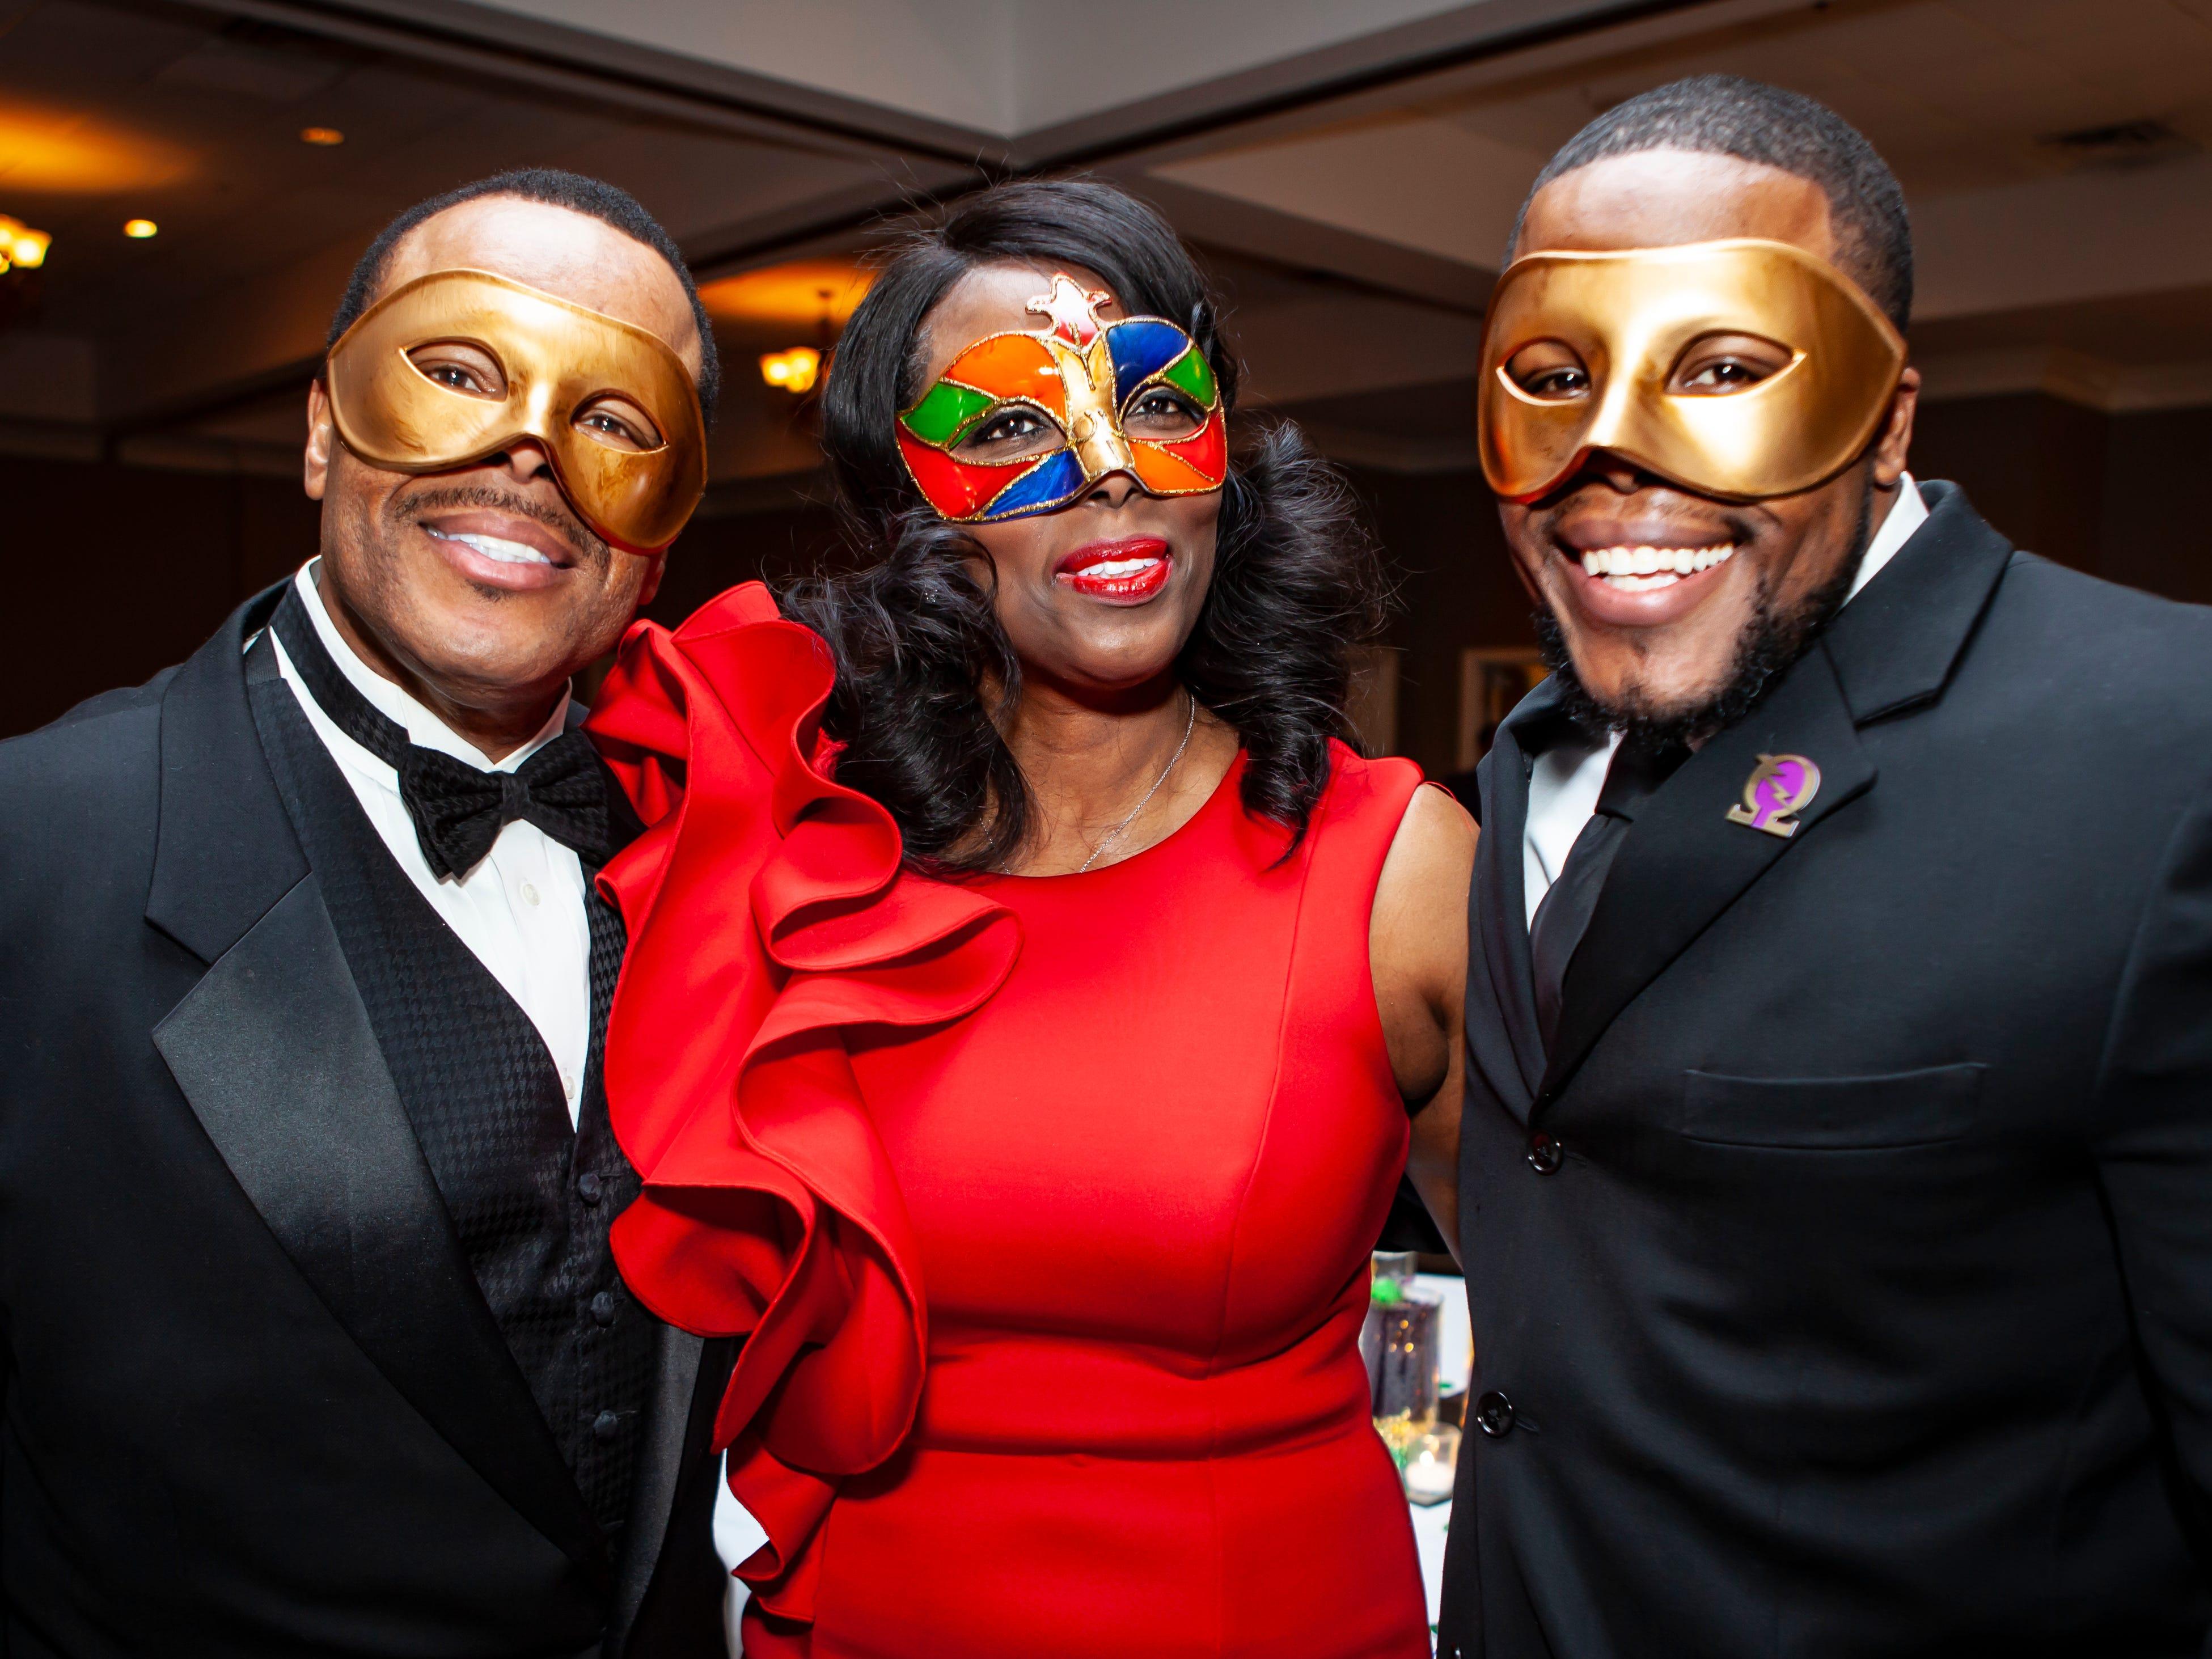 Carlos, Shenita and DeCarlos Baker at the Omega Psi Phi Mardi Gras party held Saturday, Feb. 9, 2018 at Stones River Country Club in Murfreesboro.